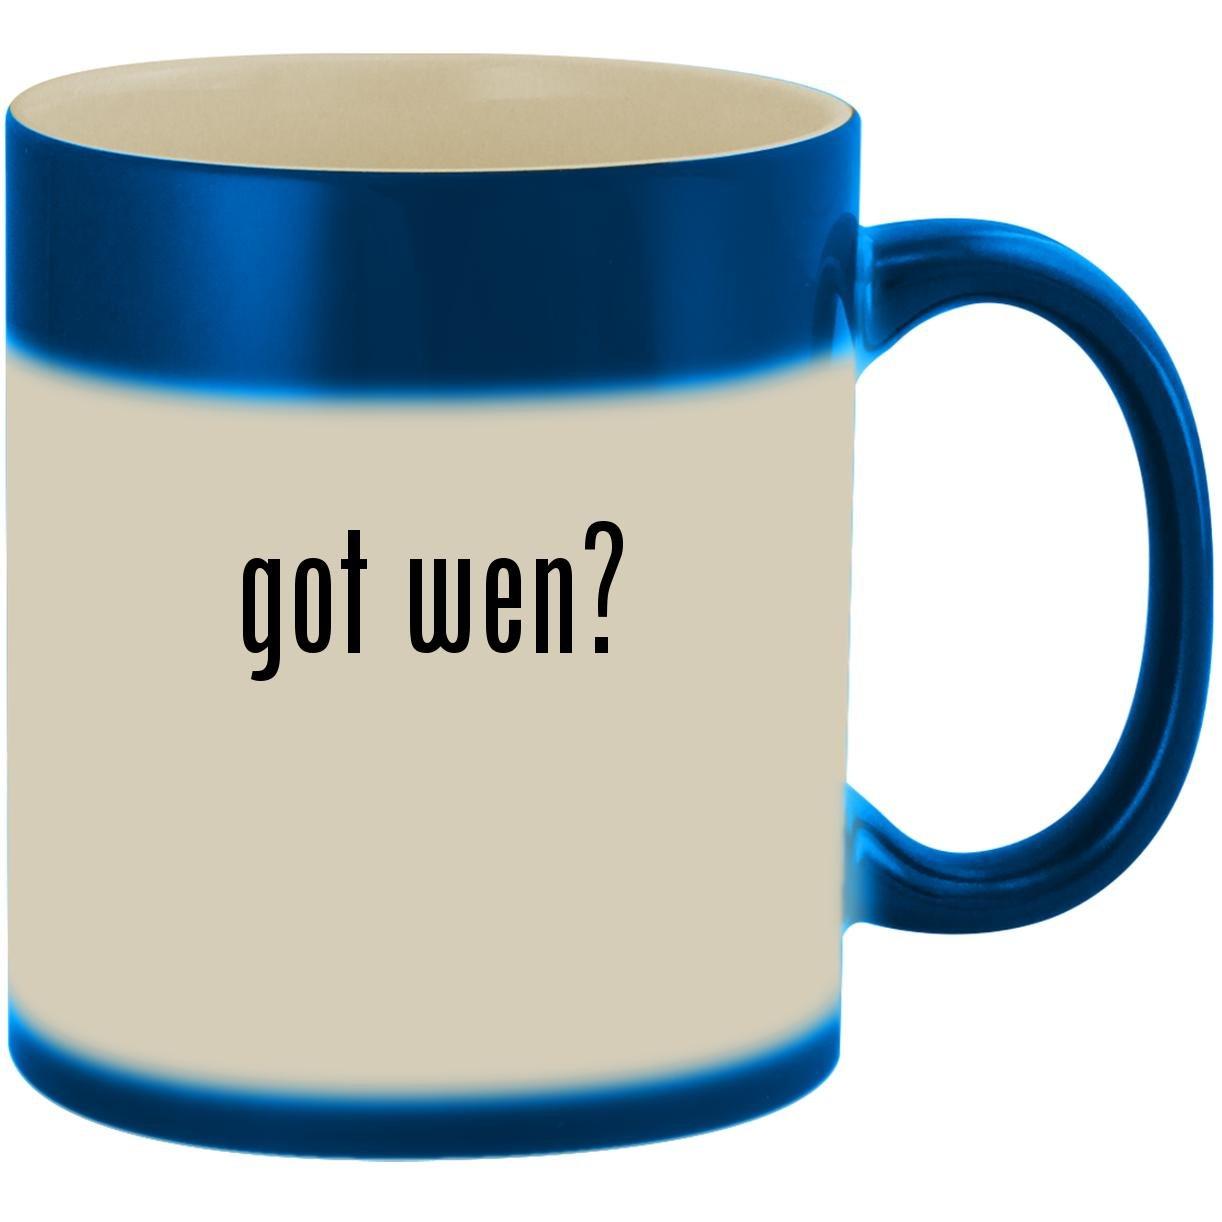 got wen? - 11oz Ceramic Color Changing Heat Sensitive Coffee Mug Cup, Blue